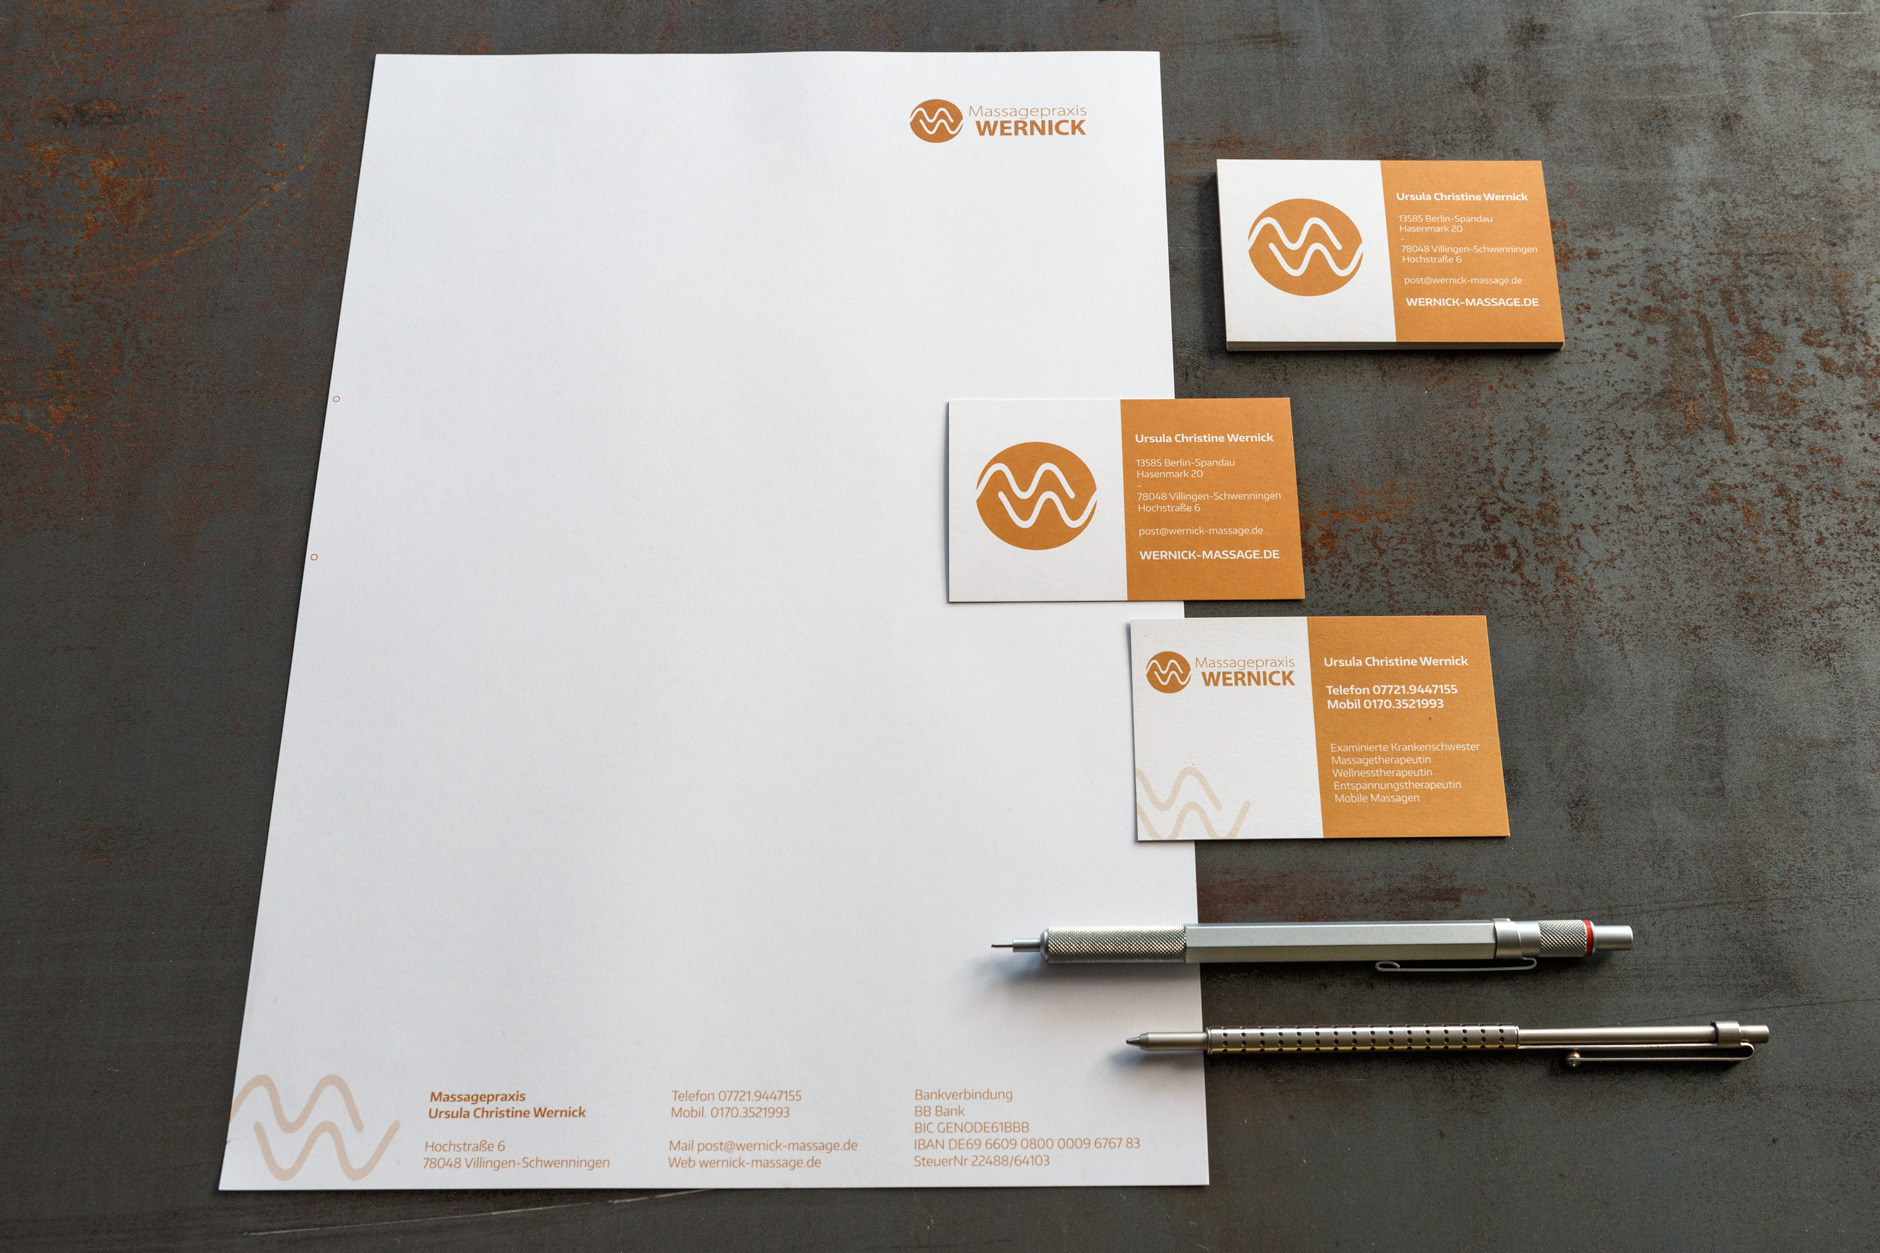 Wernick Visitenkarten Briefpapier Flyer Tectra Design